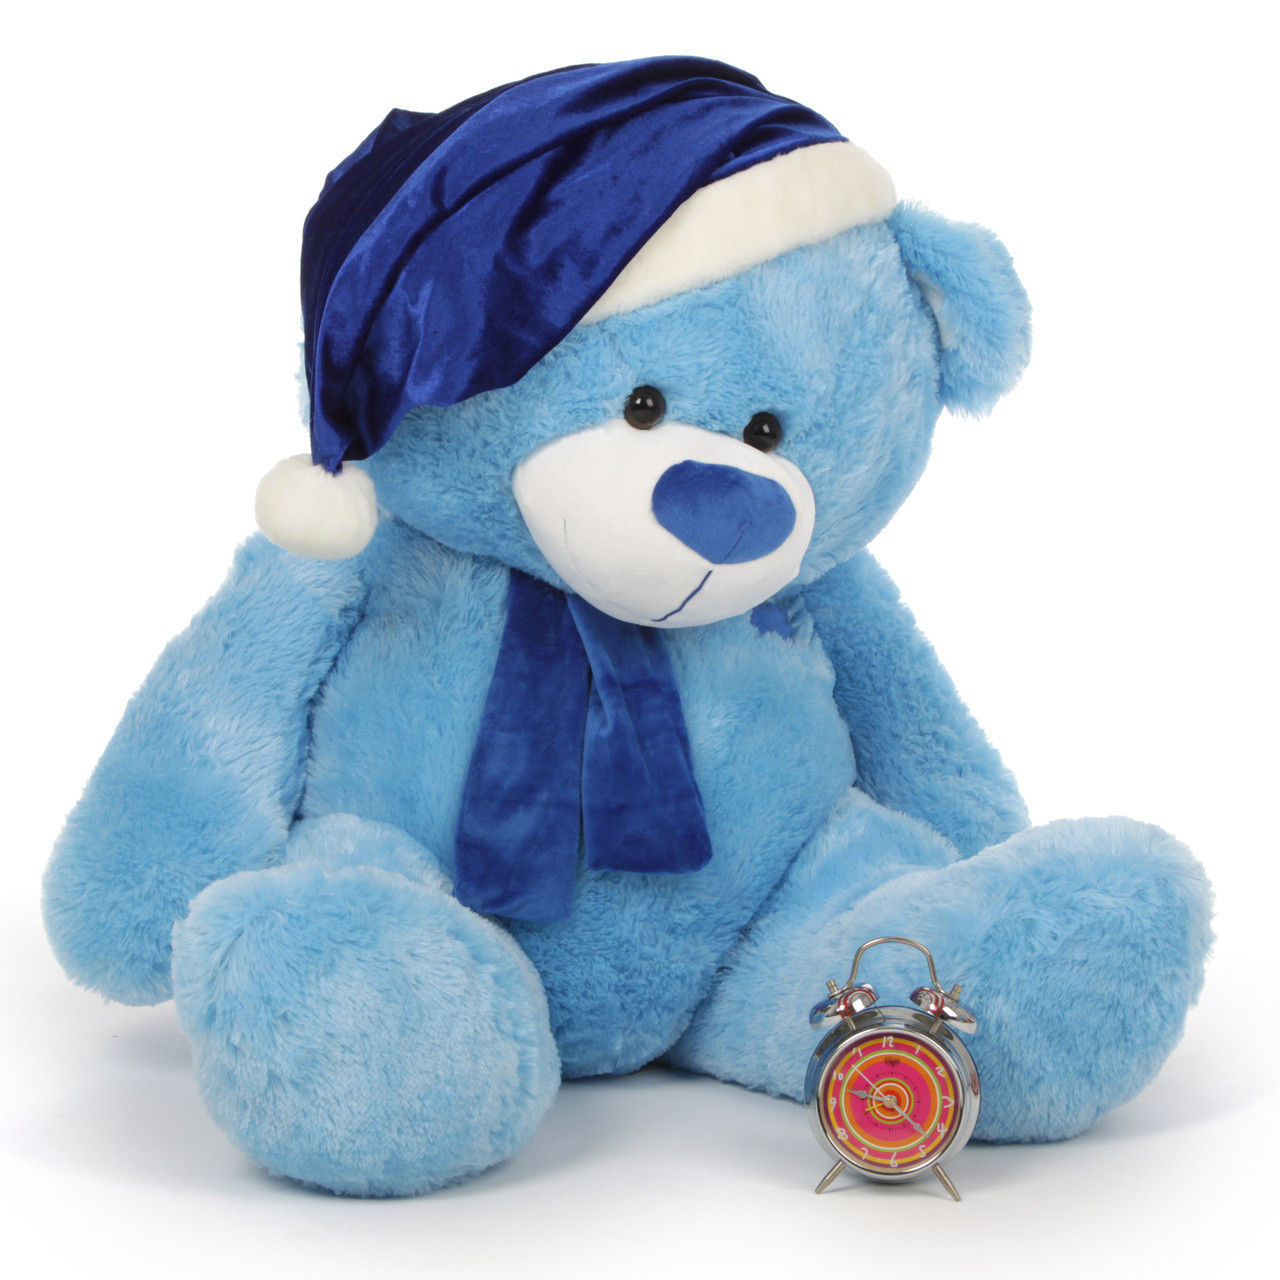 cdbb668c5e6a Marty Shags Light Blue Giant Christmas Teddy Bear in Blue Santa Hat 35in